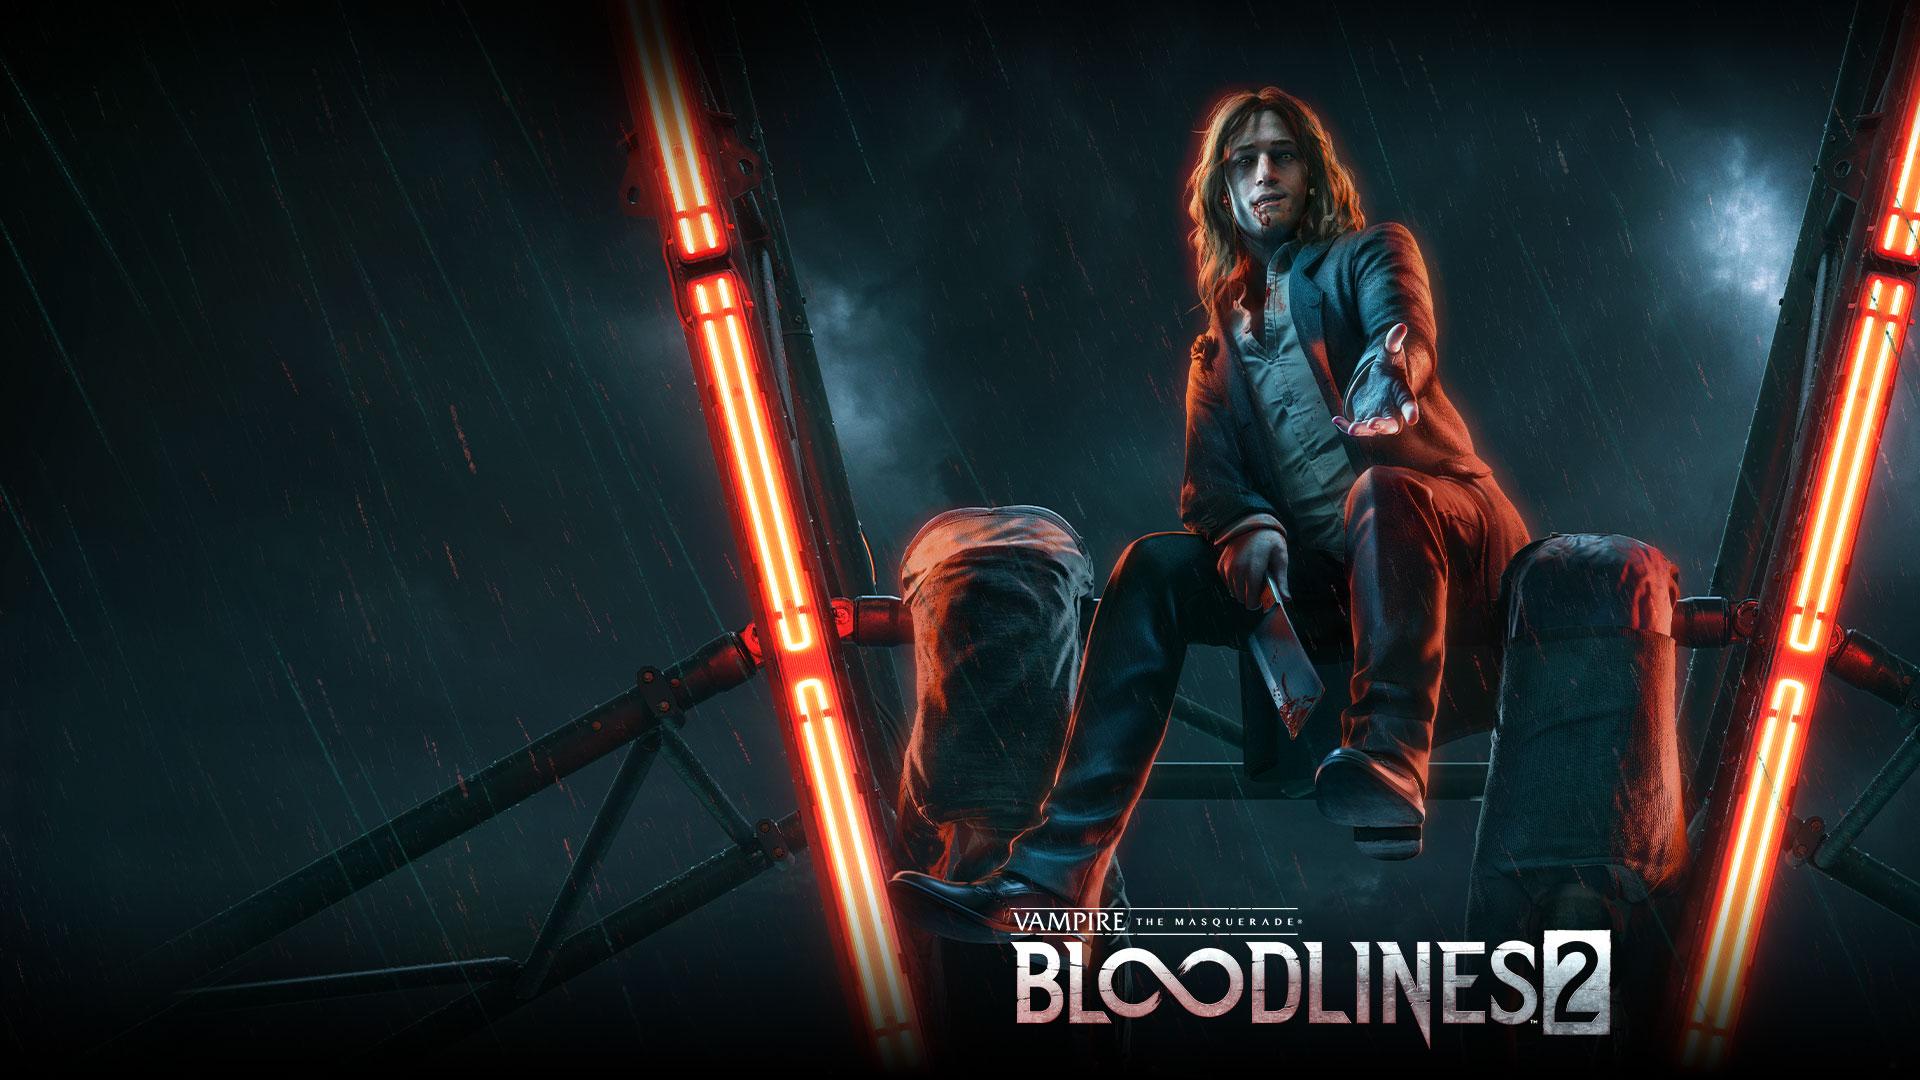 Vampire: The Masquerade - Bloodline 2